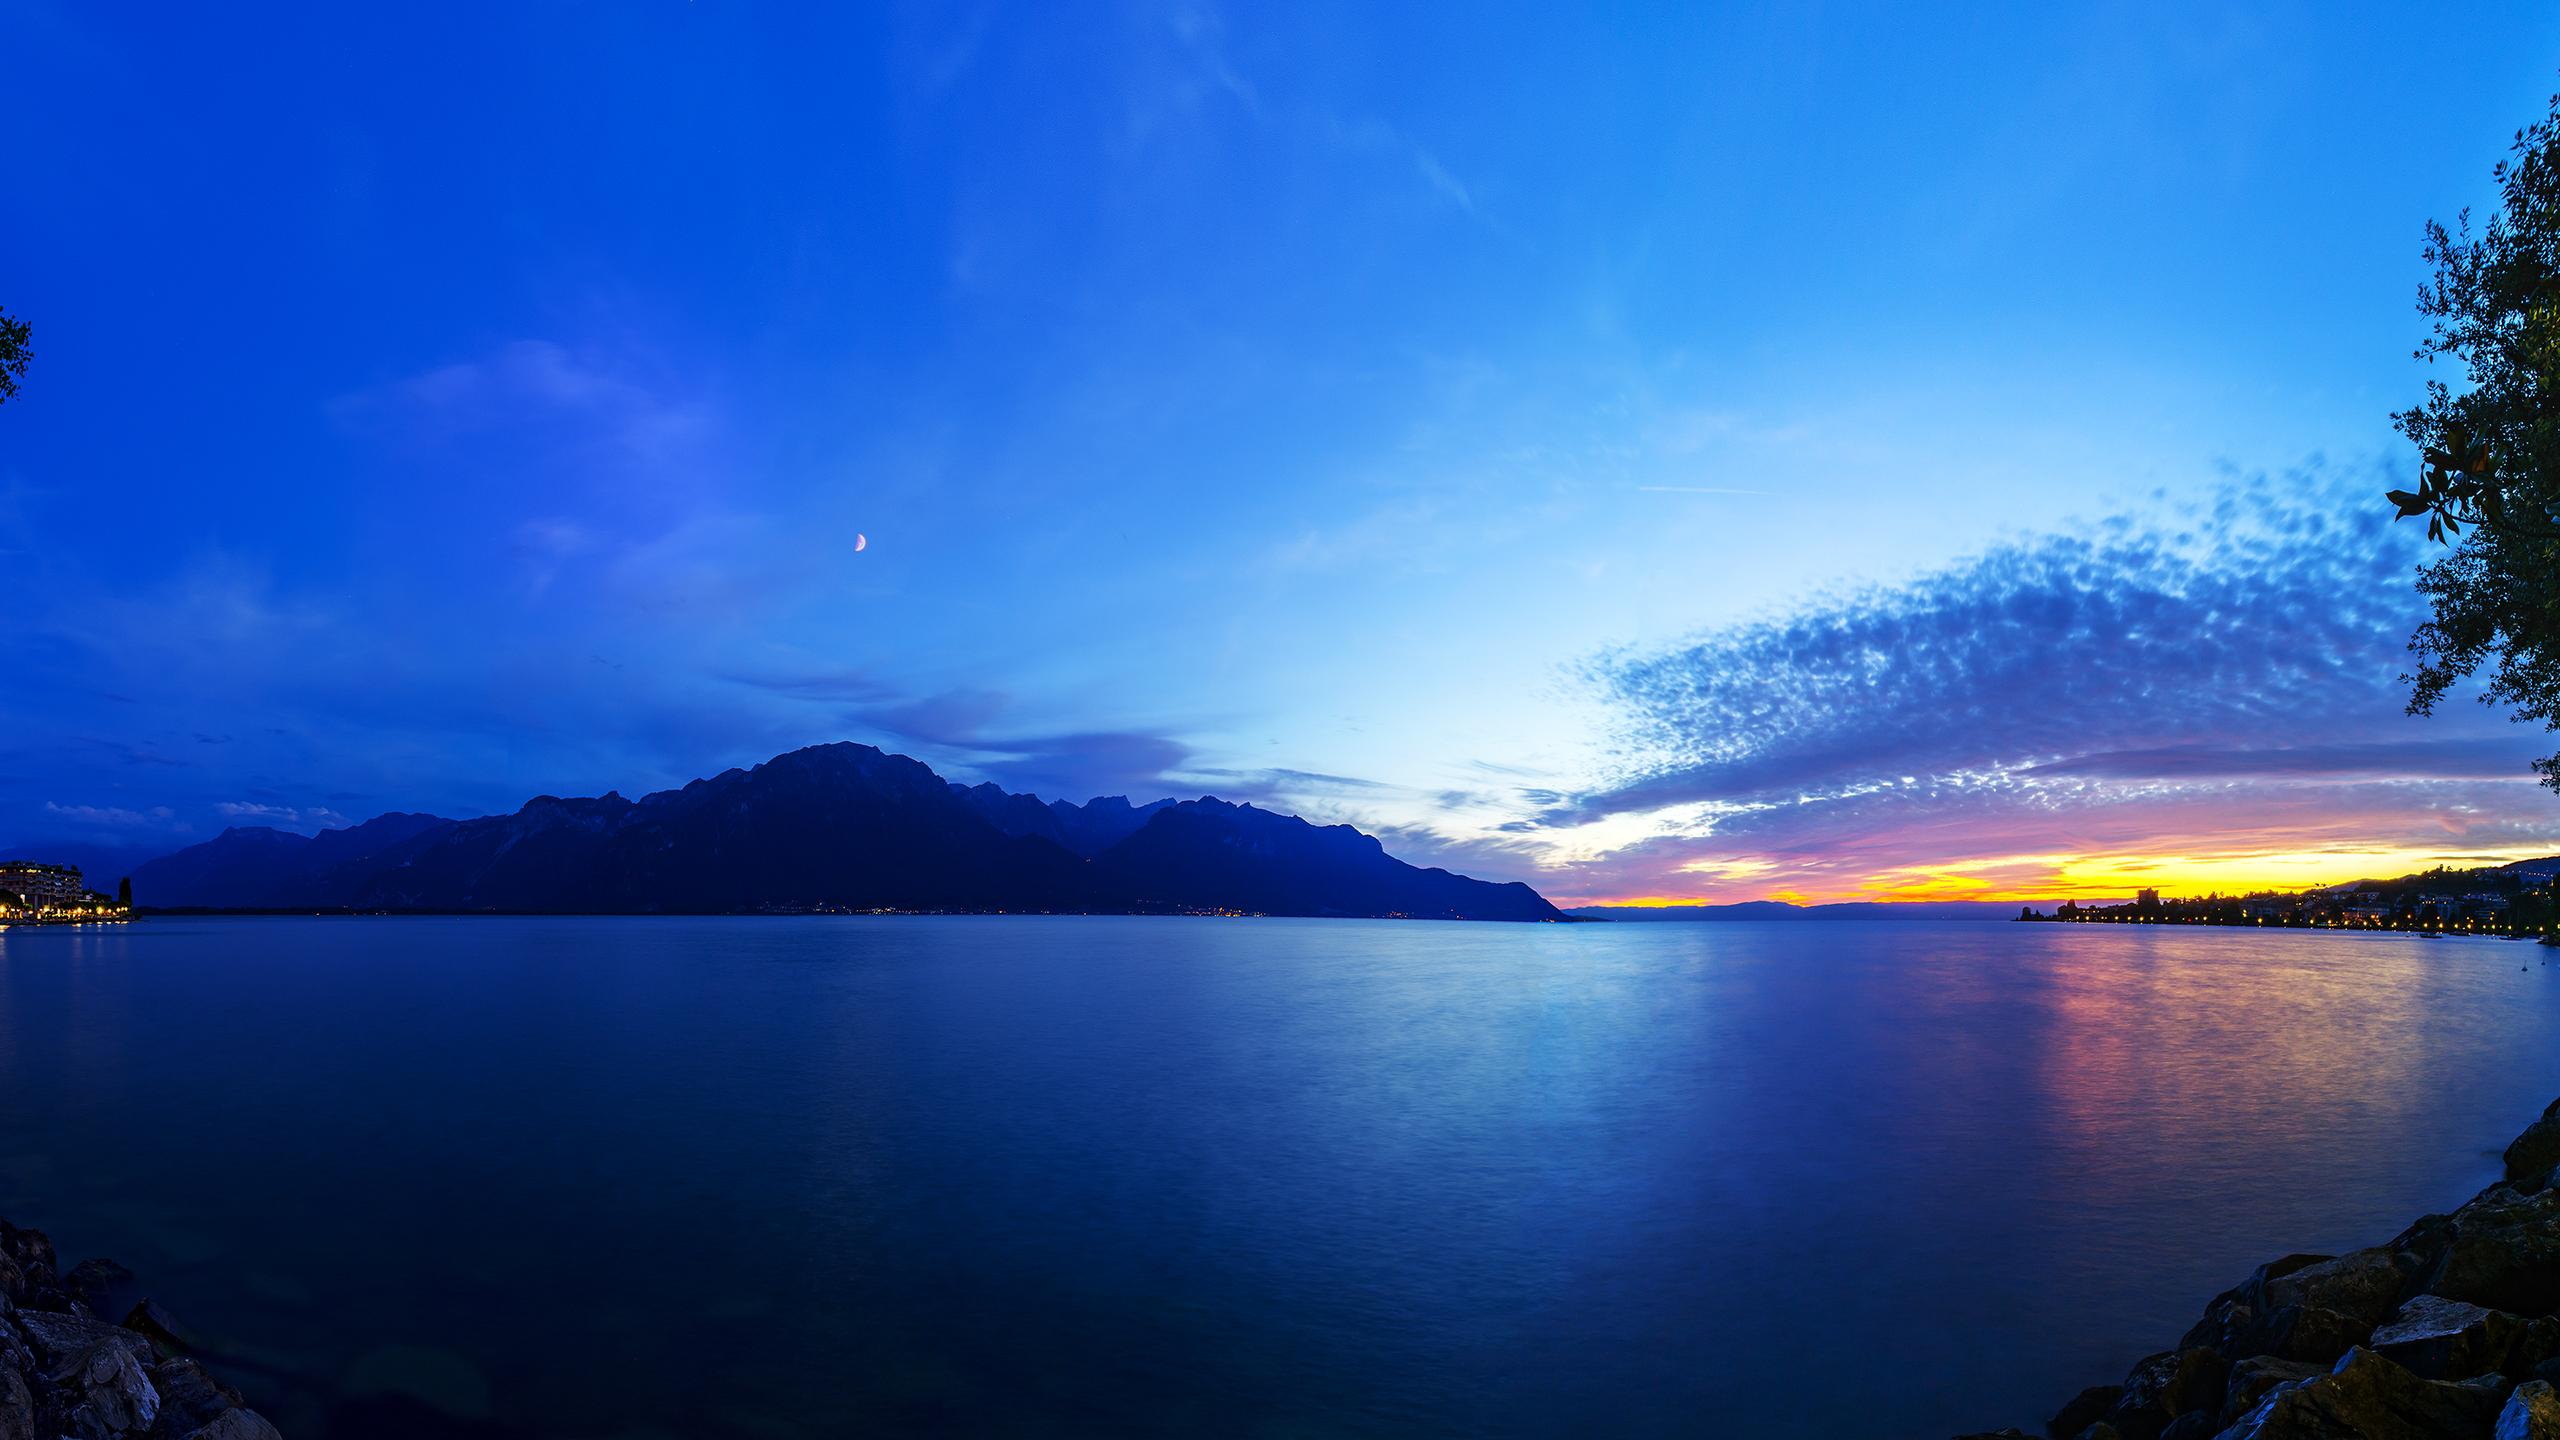 blue_dawn_wallpaper_2560x1440